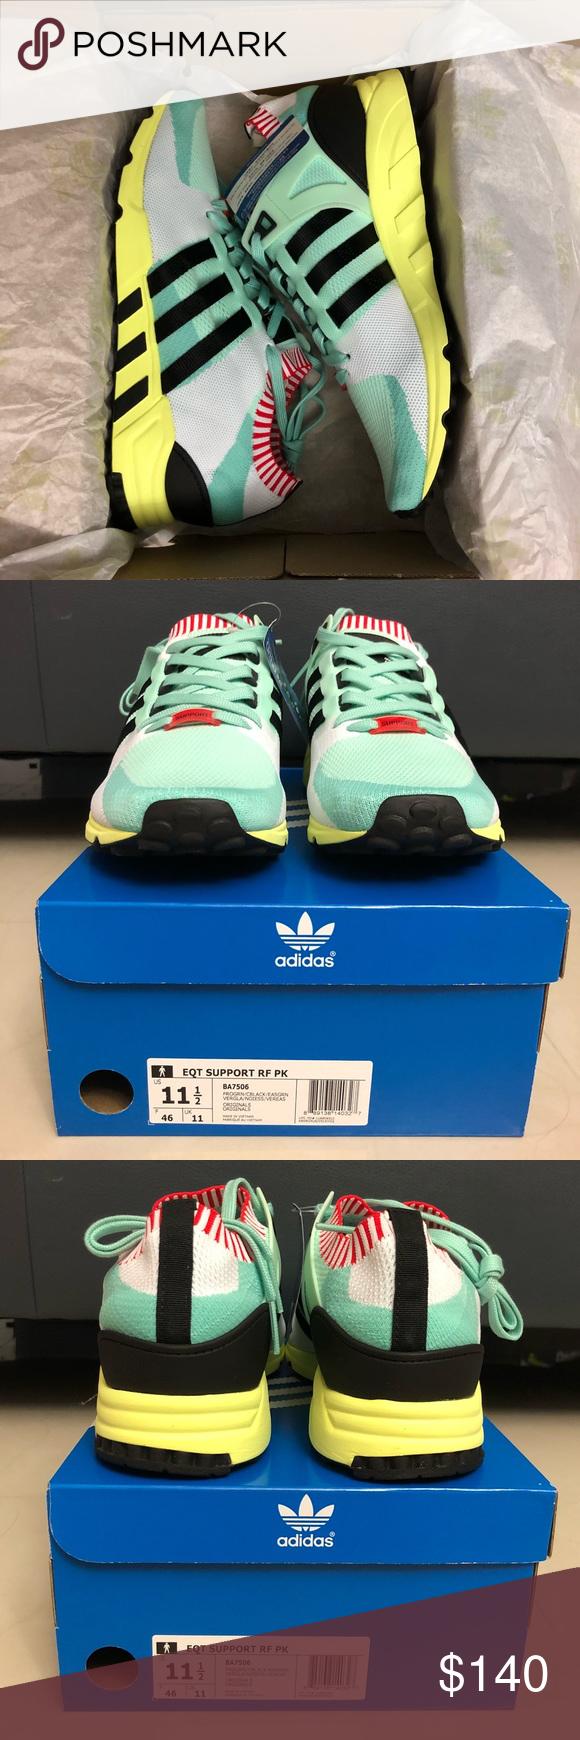 adidas eqt support rf primeknit frozen green